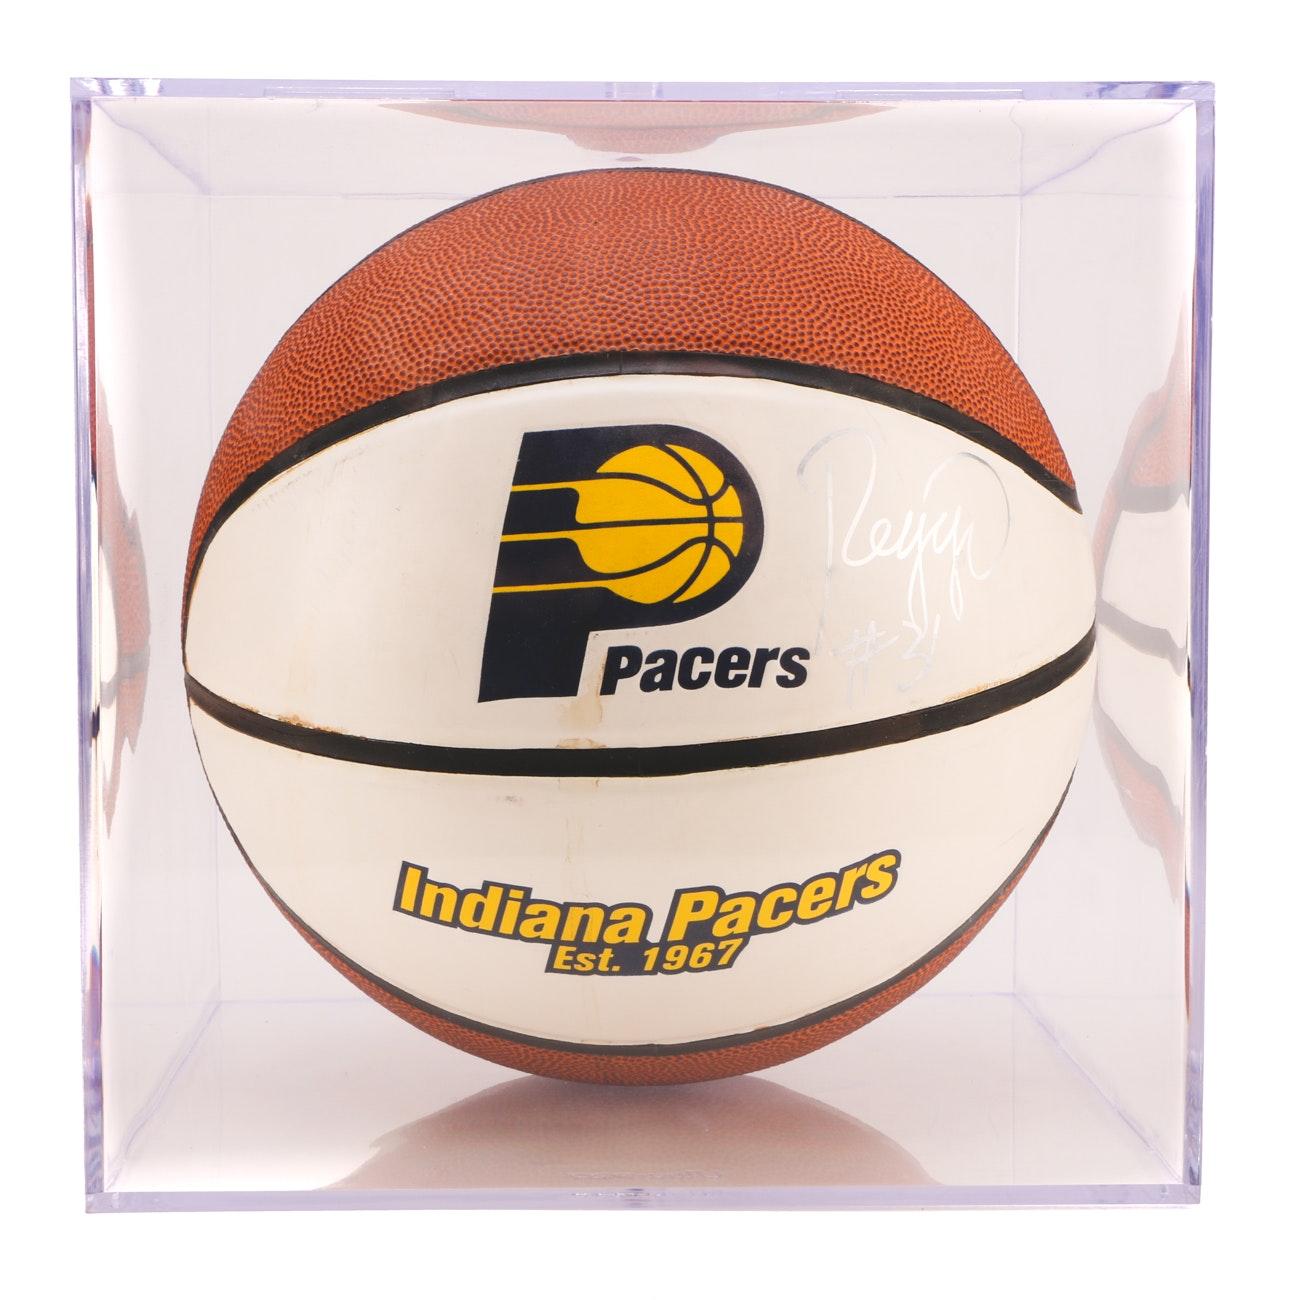 Reggie Miller Signed Pacers Basketball  COA